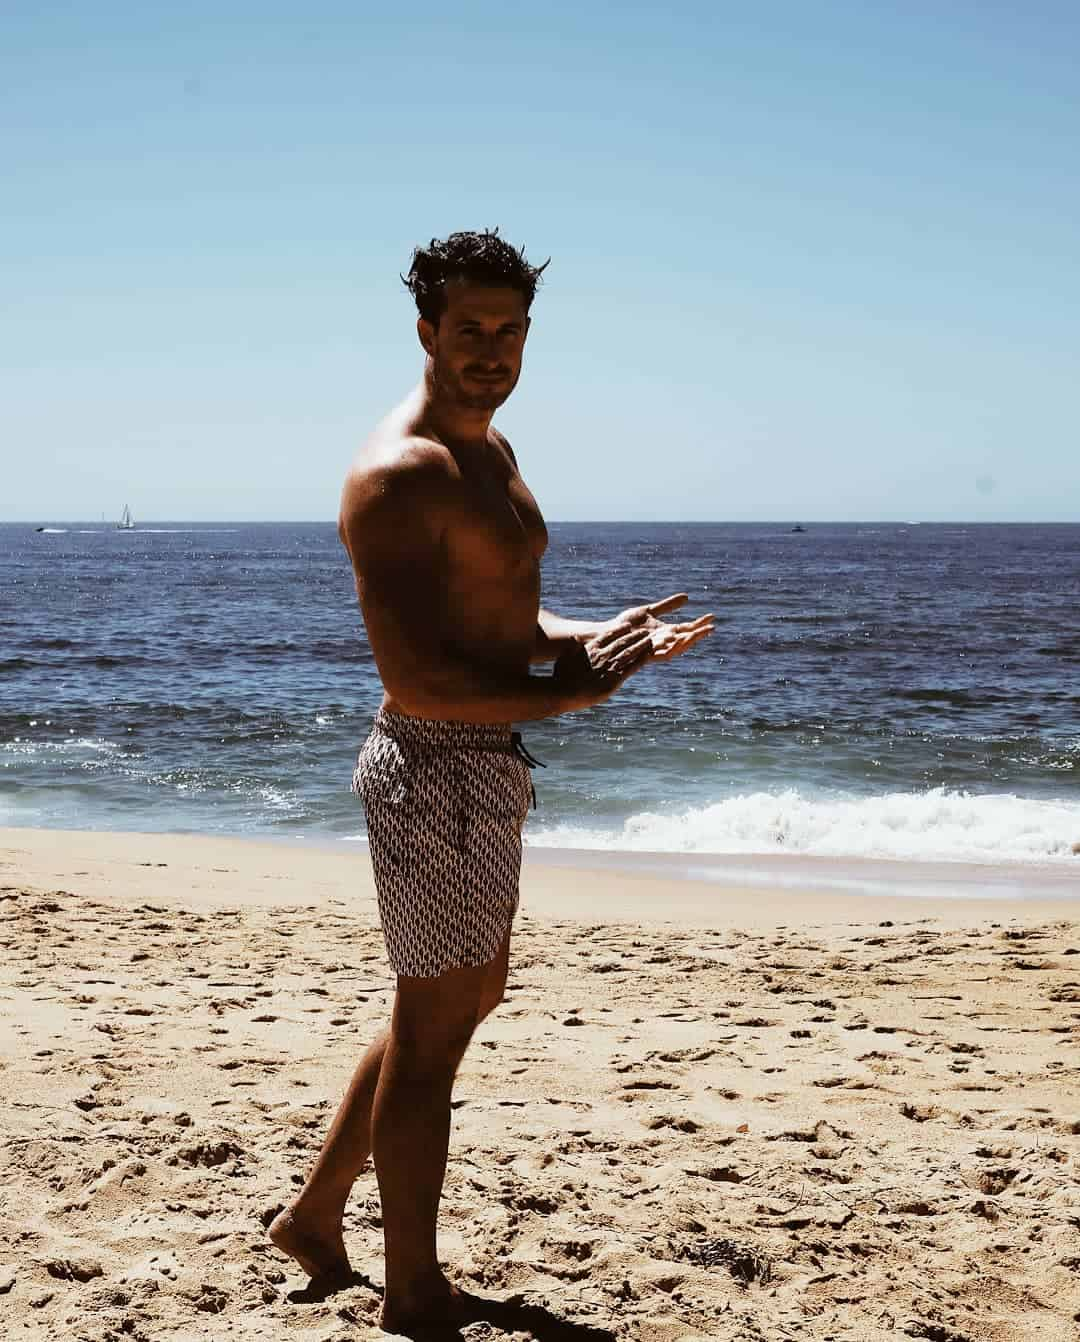 summer-shorts-for-men-2019